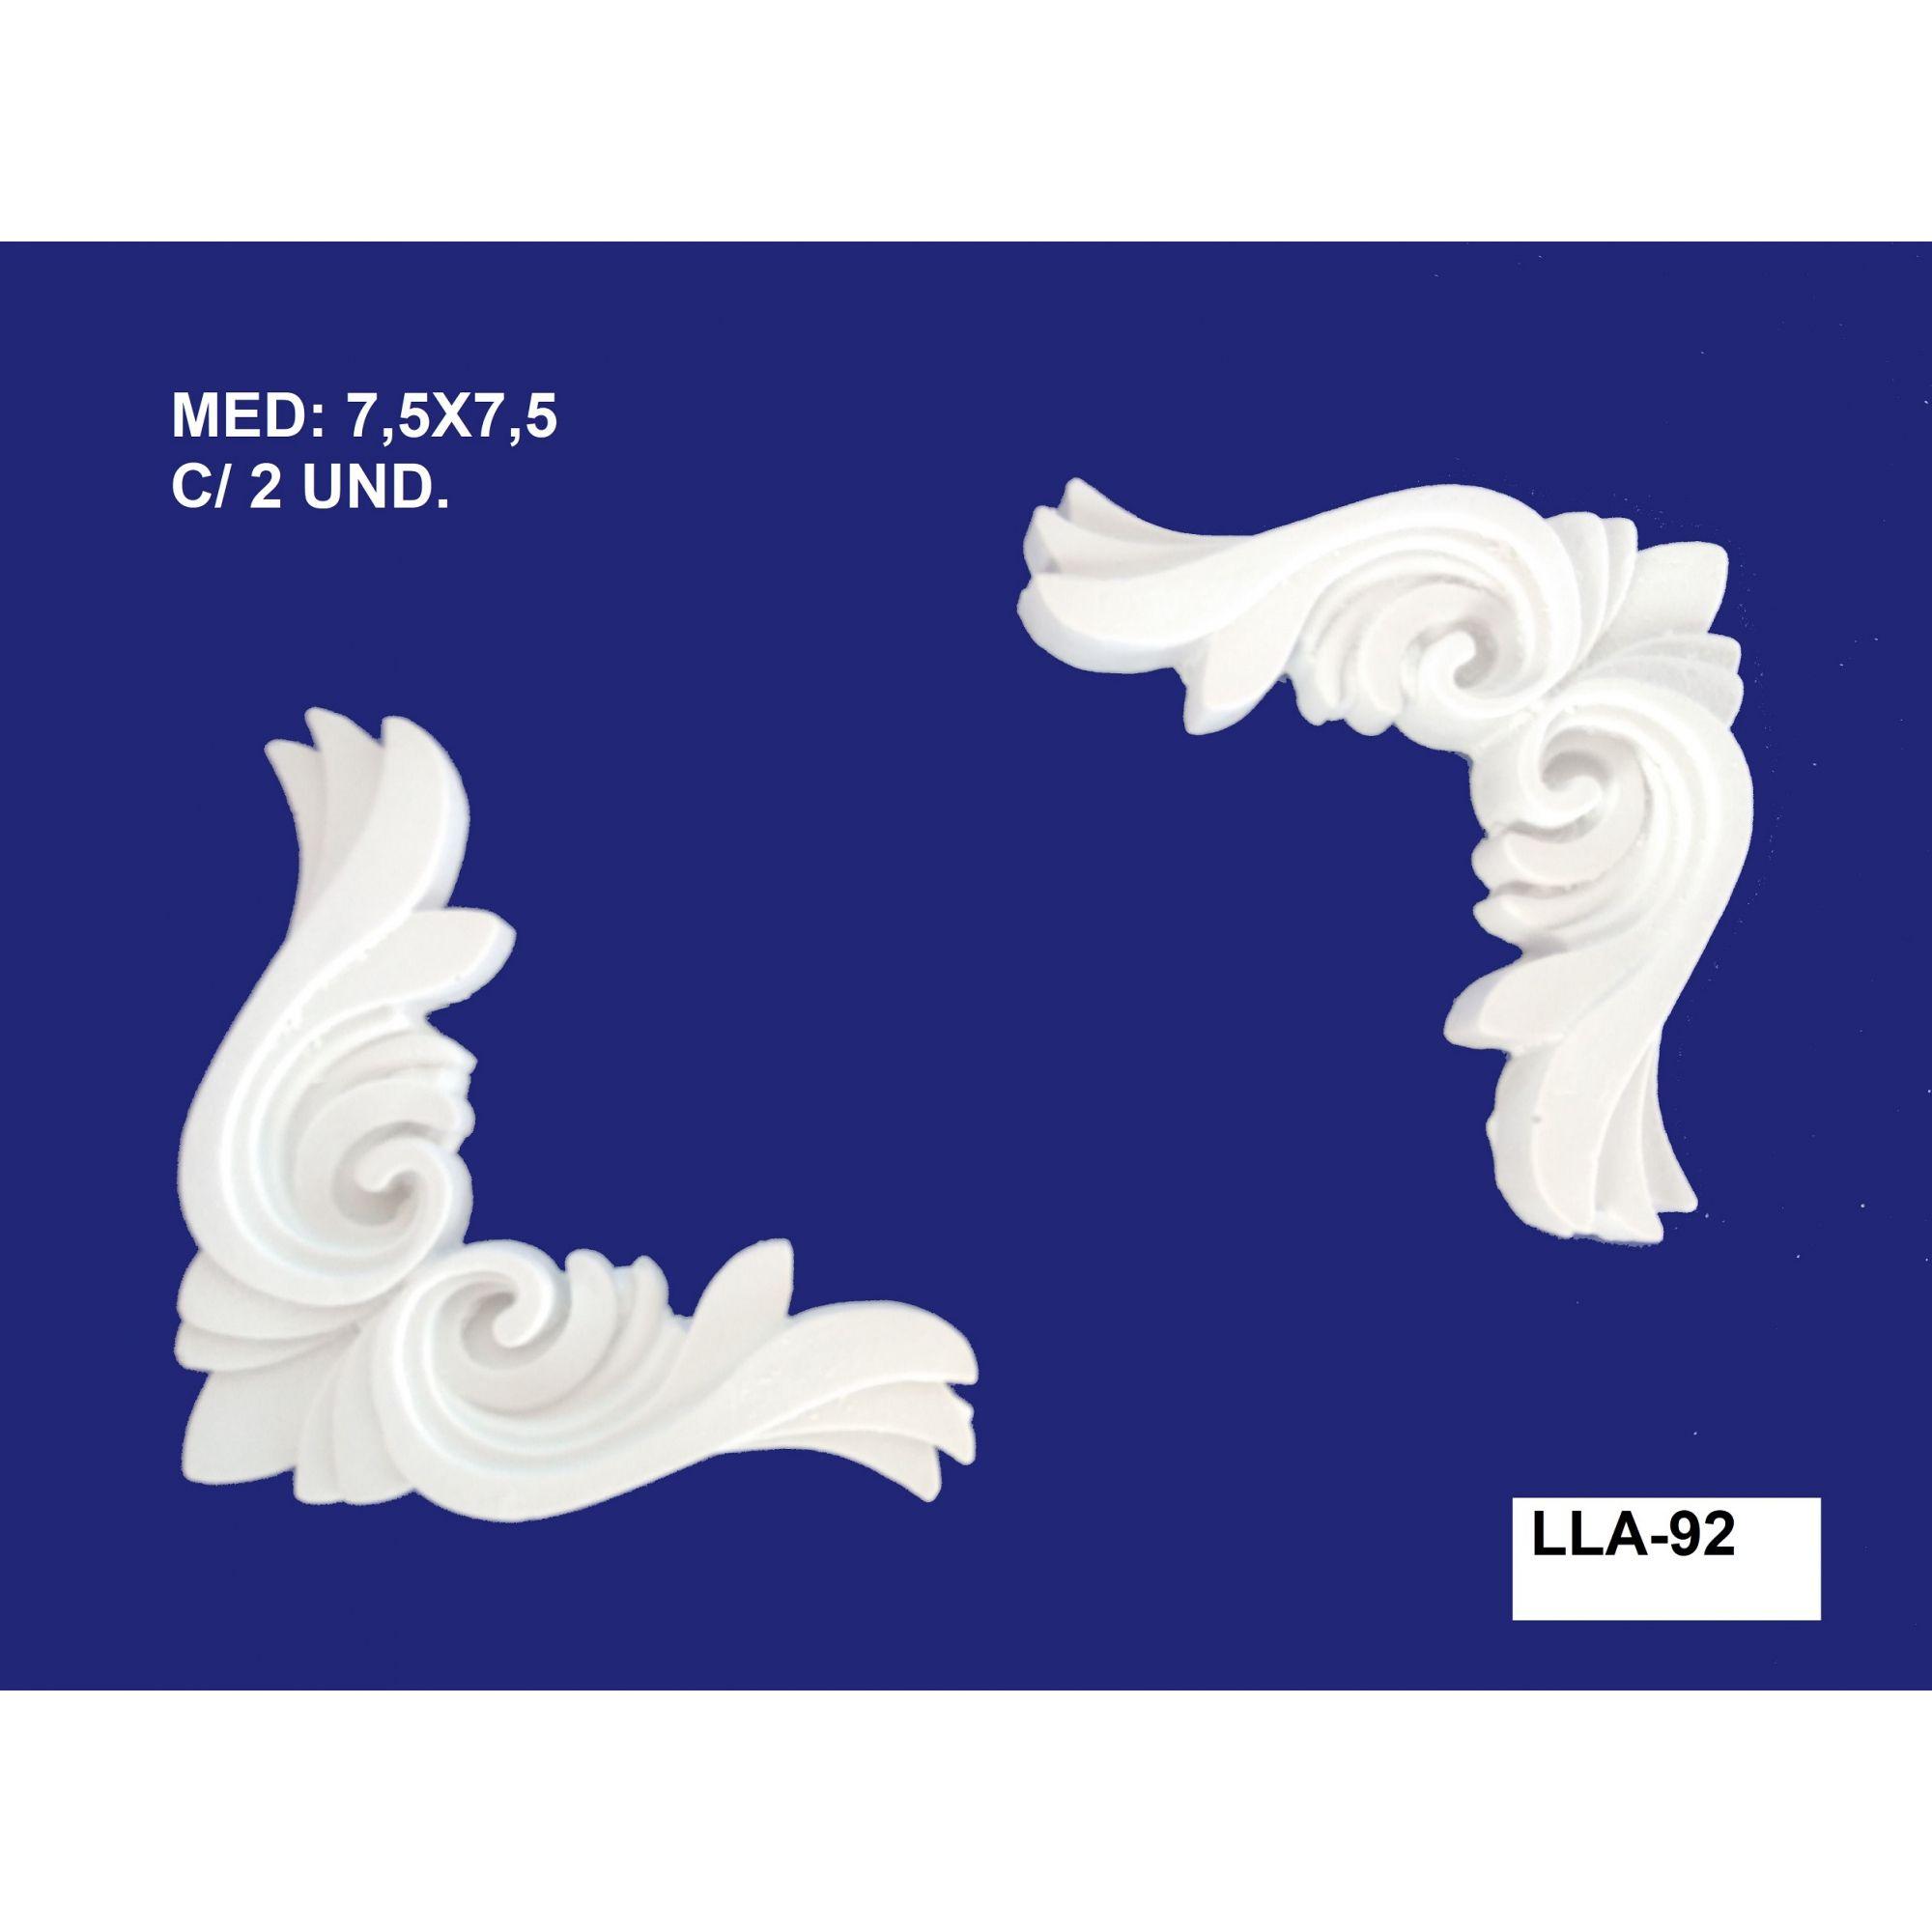 LLA-92 CANTONEIRAS 7,5X7,5CM C/ 2 UND.